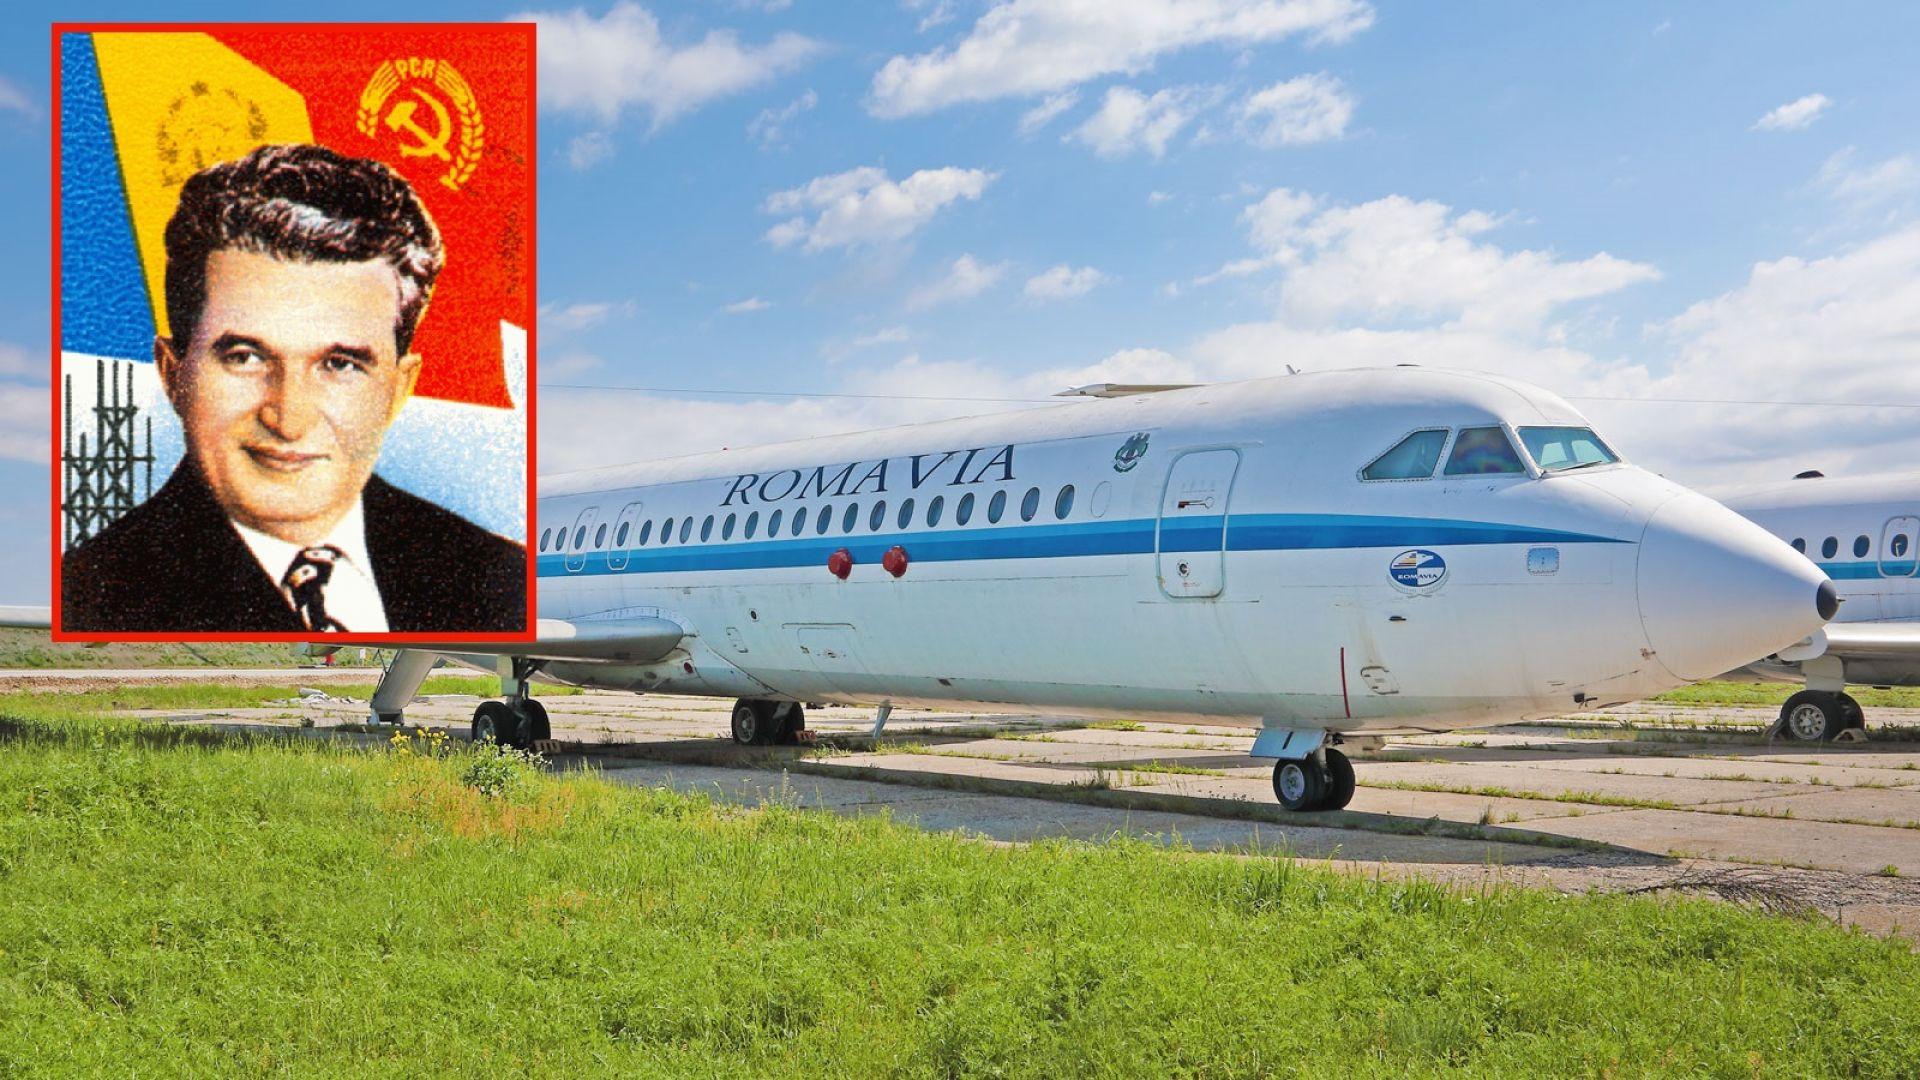 Продадоха самолета и лимузината на Чаушеску (снимки)